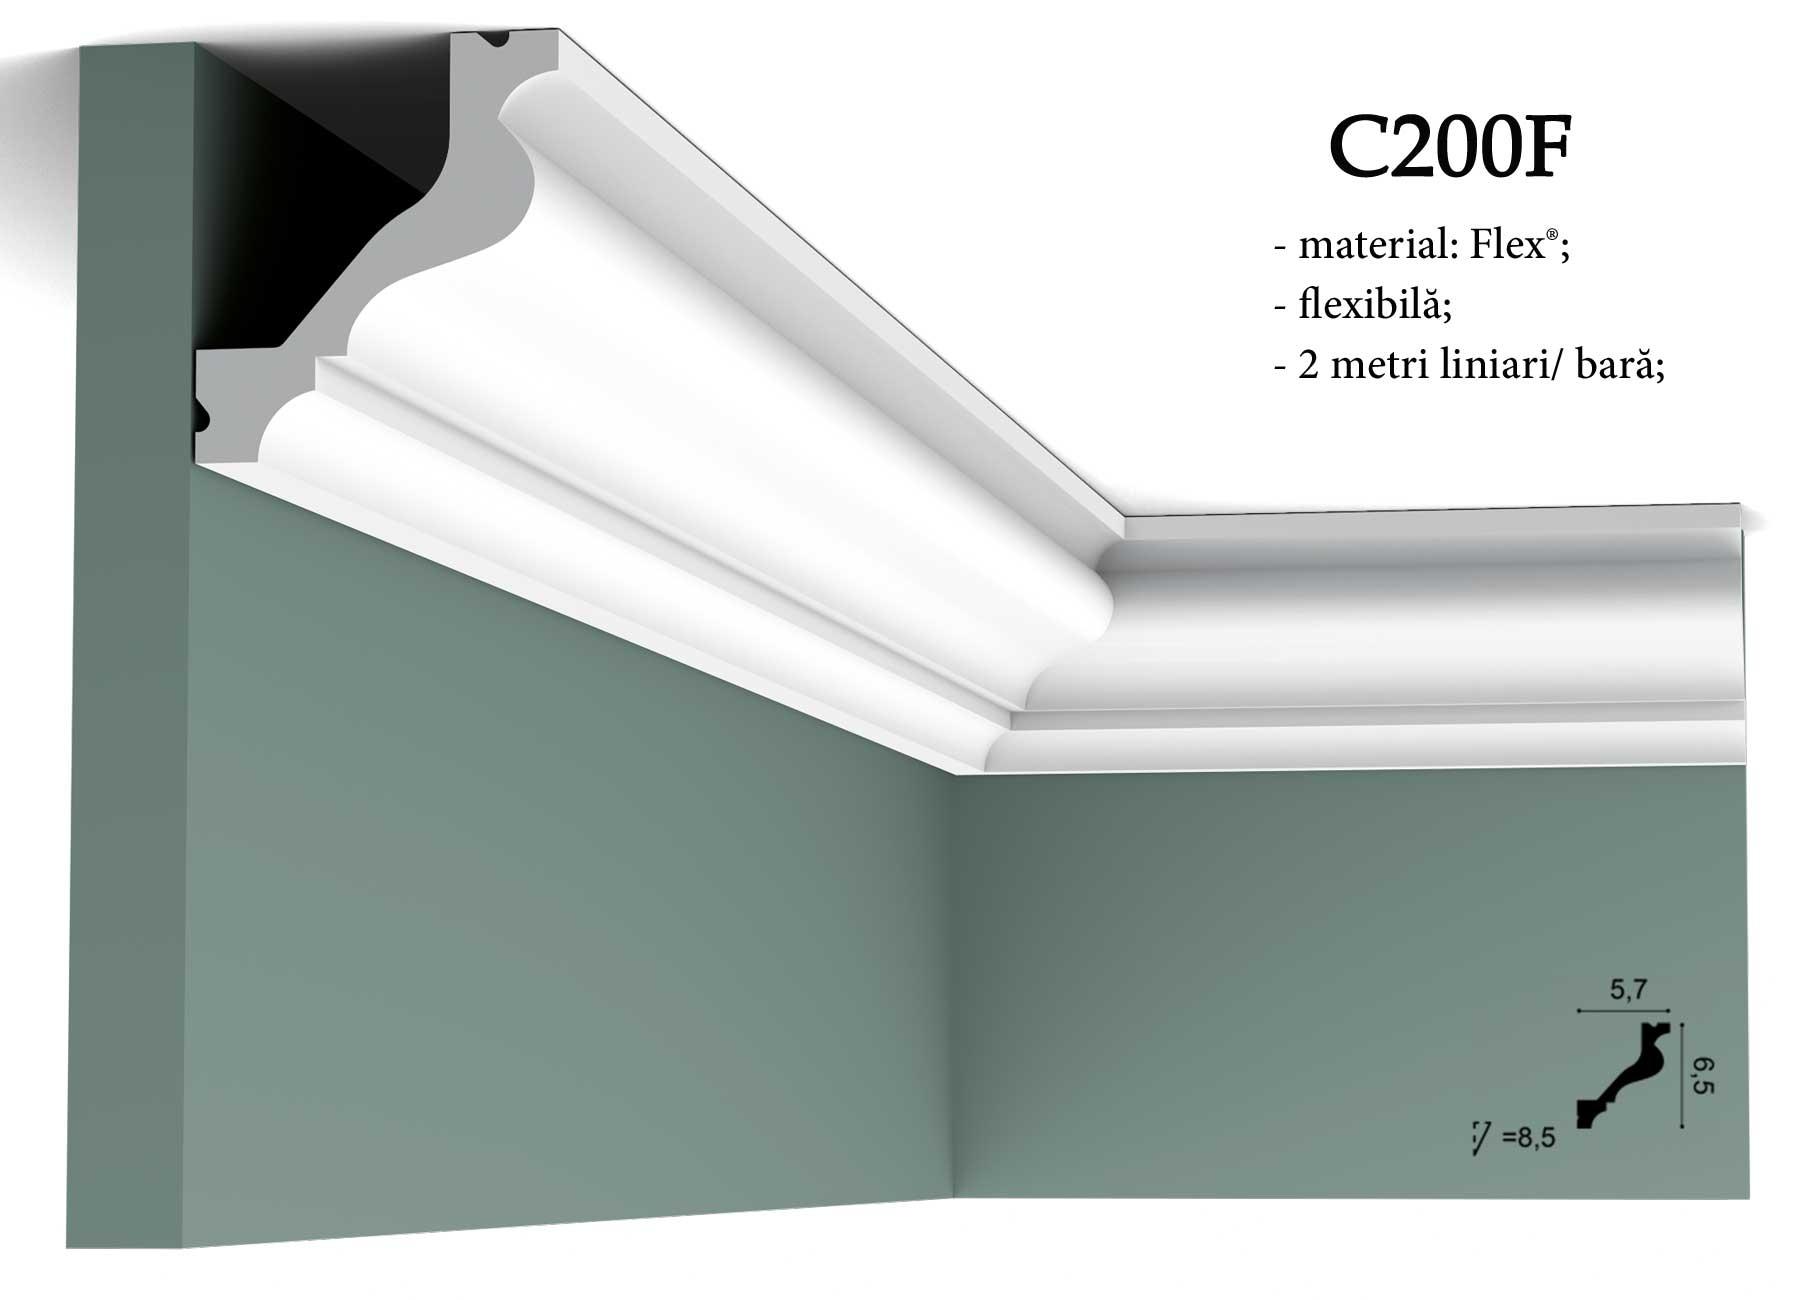 Cornisa pentru tavan Orac Decor C200F